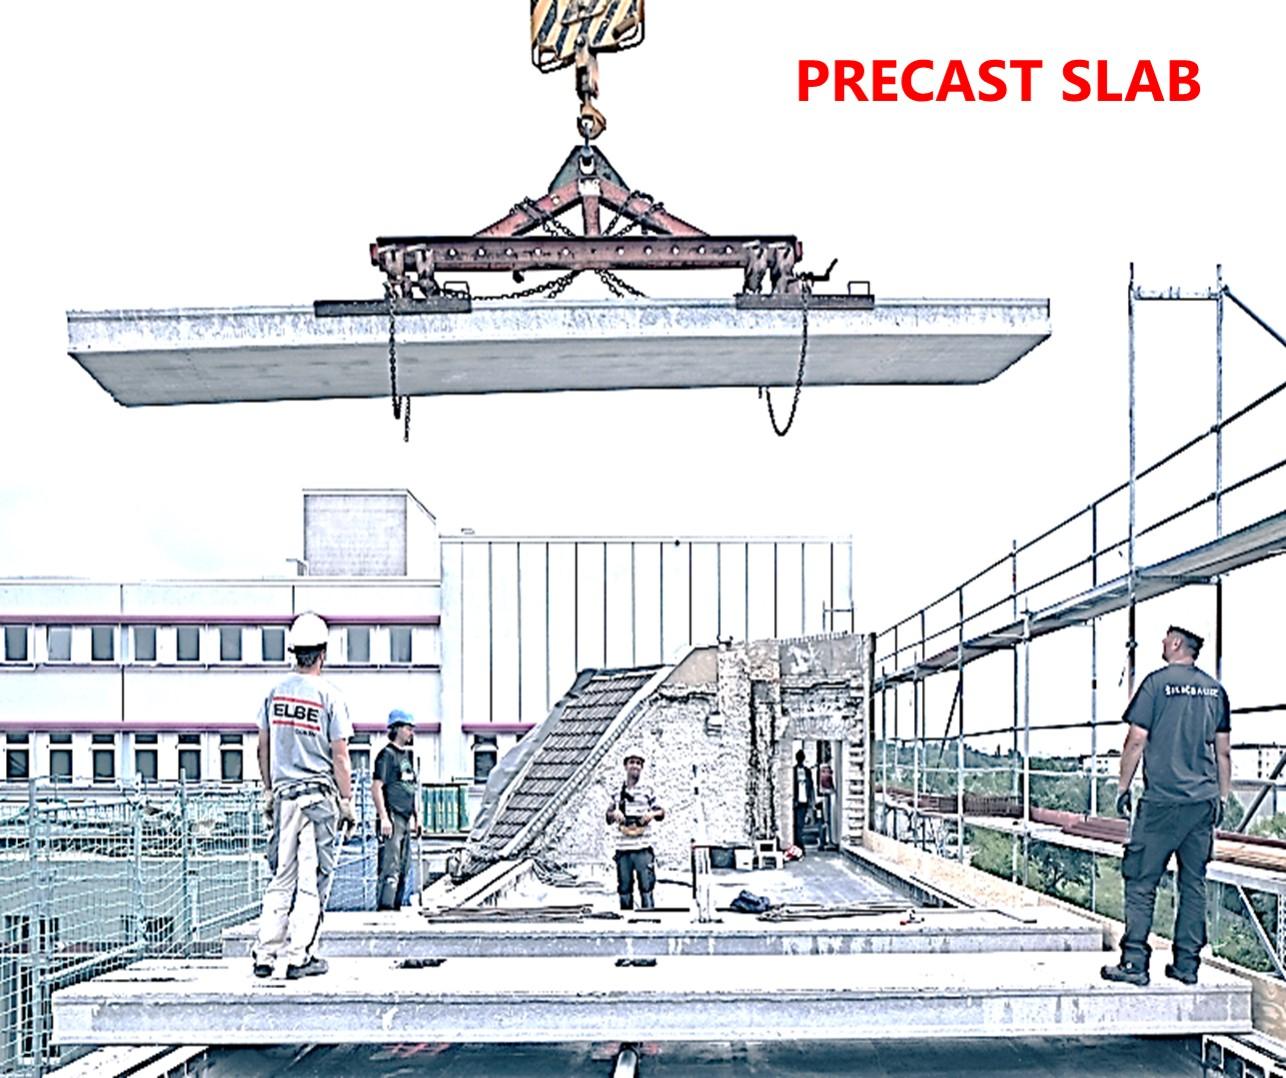 PRECAST SLAB